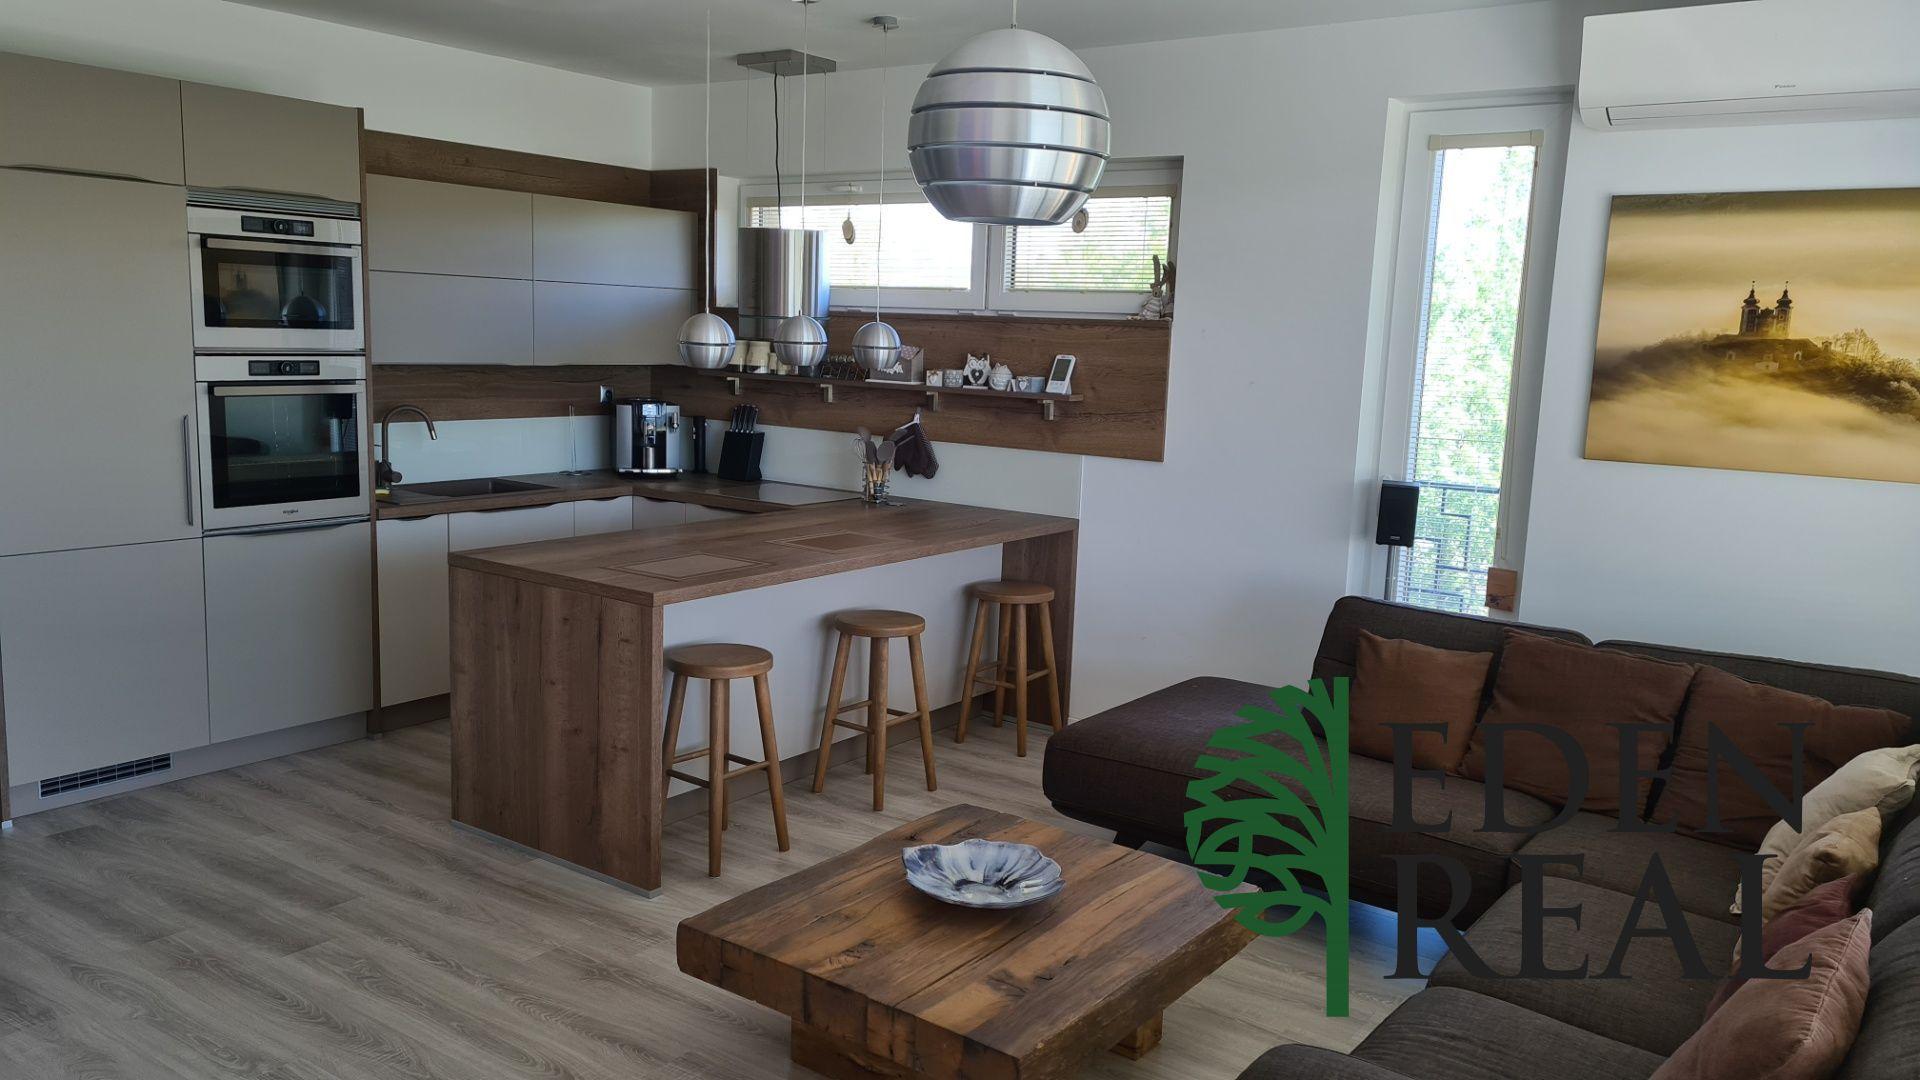 Novostavba 4-izbového bytu s 2 loggiami, garážovým a parkovacím státím v cene